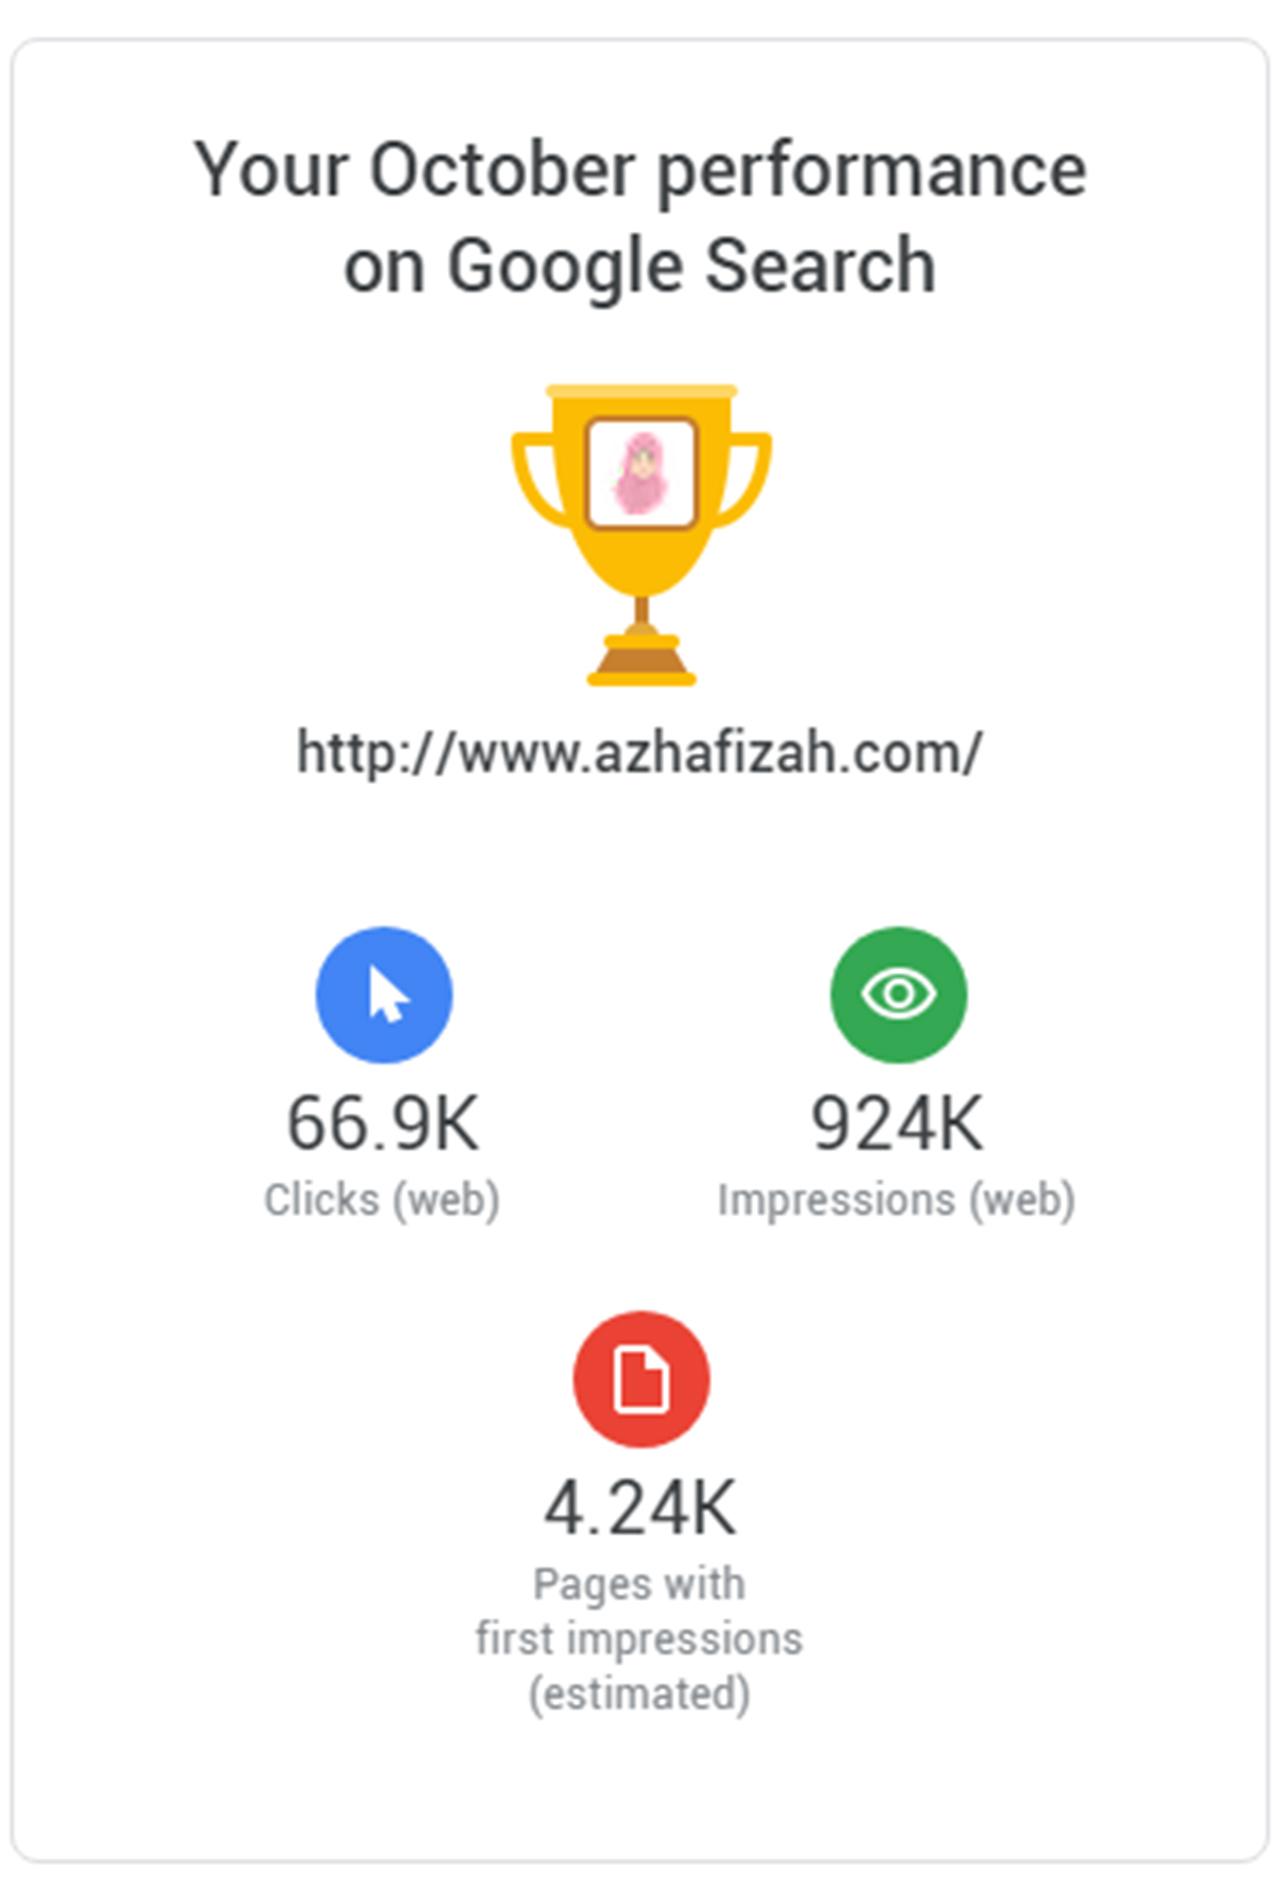 Azhafizah.com October Performance On Google Search